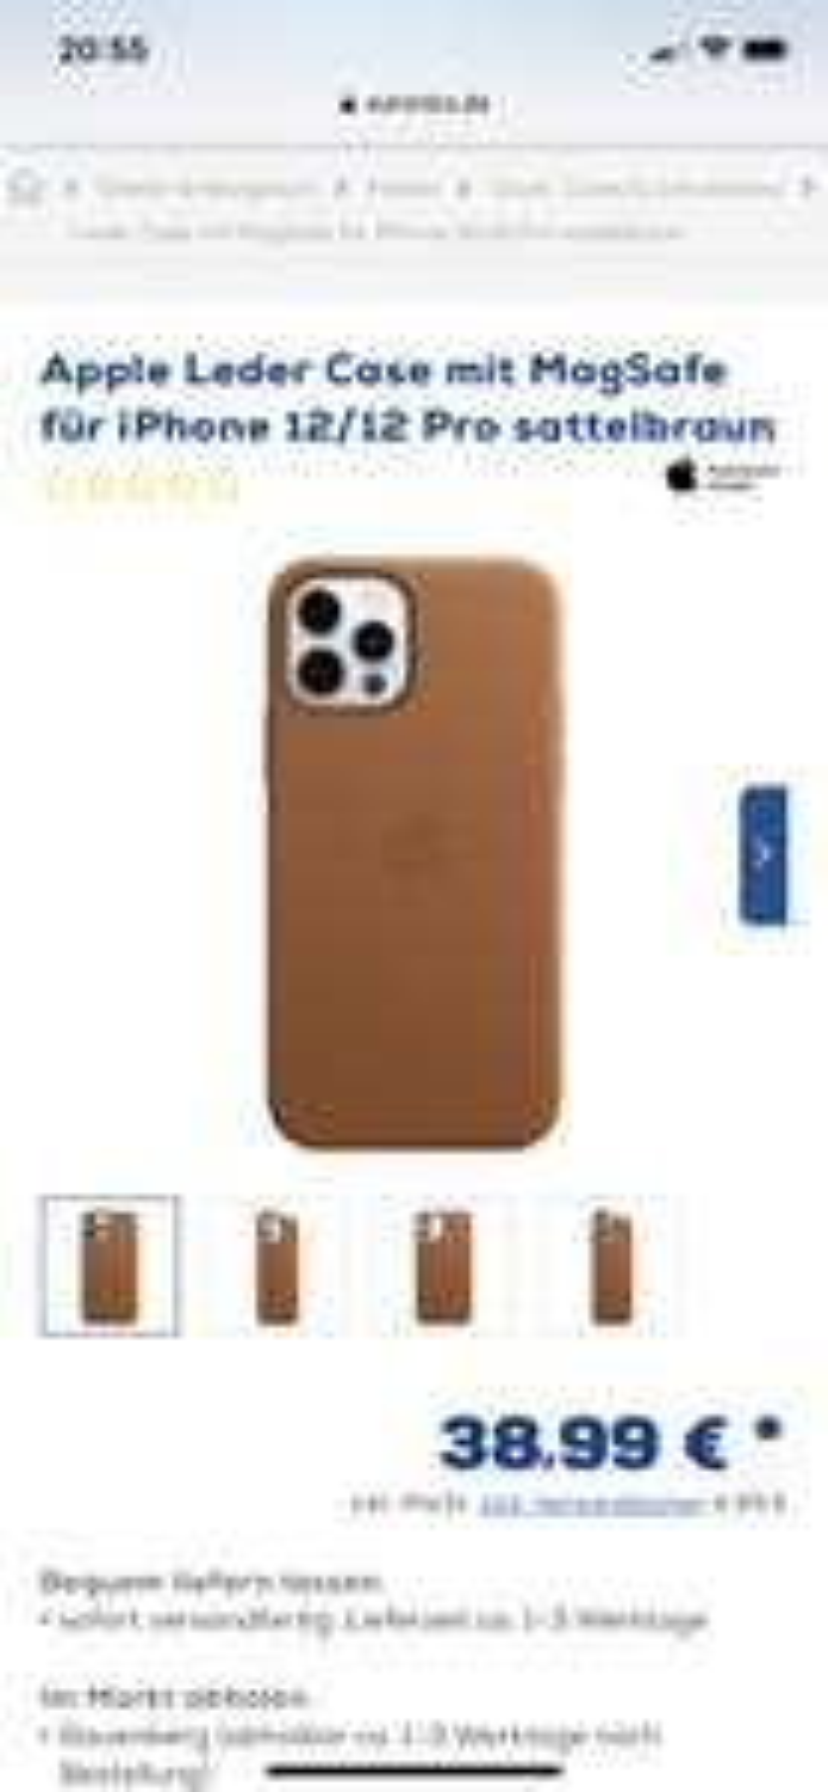 Apple Leder Case mit MagSafe für iPhone 12/12 Pro/Pro Max sattelbraun - Euronics Rauenberg